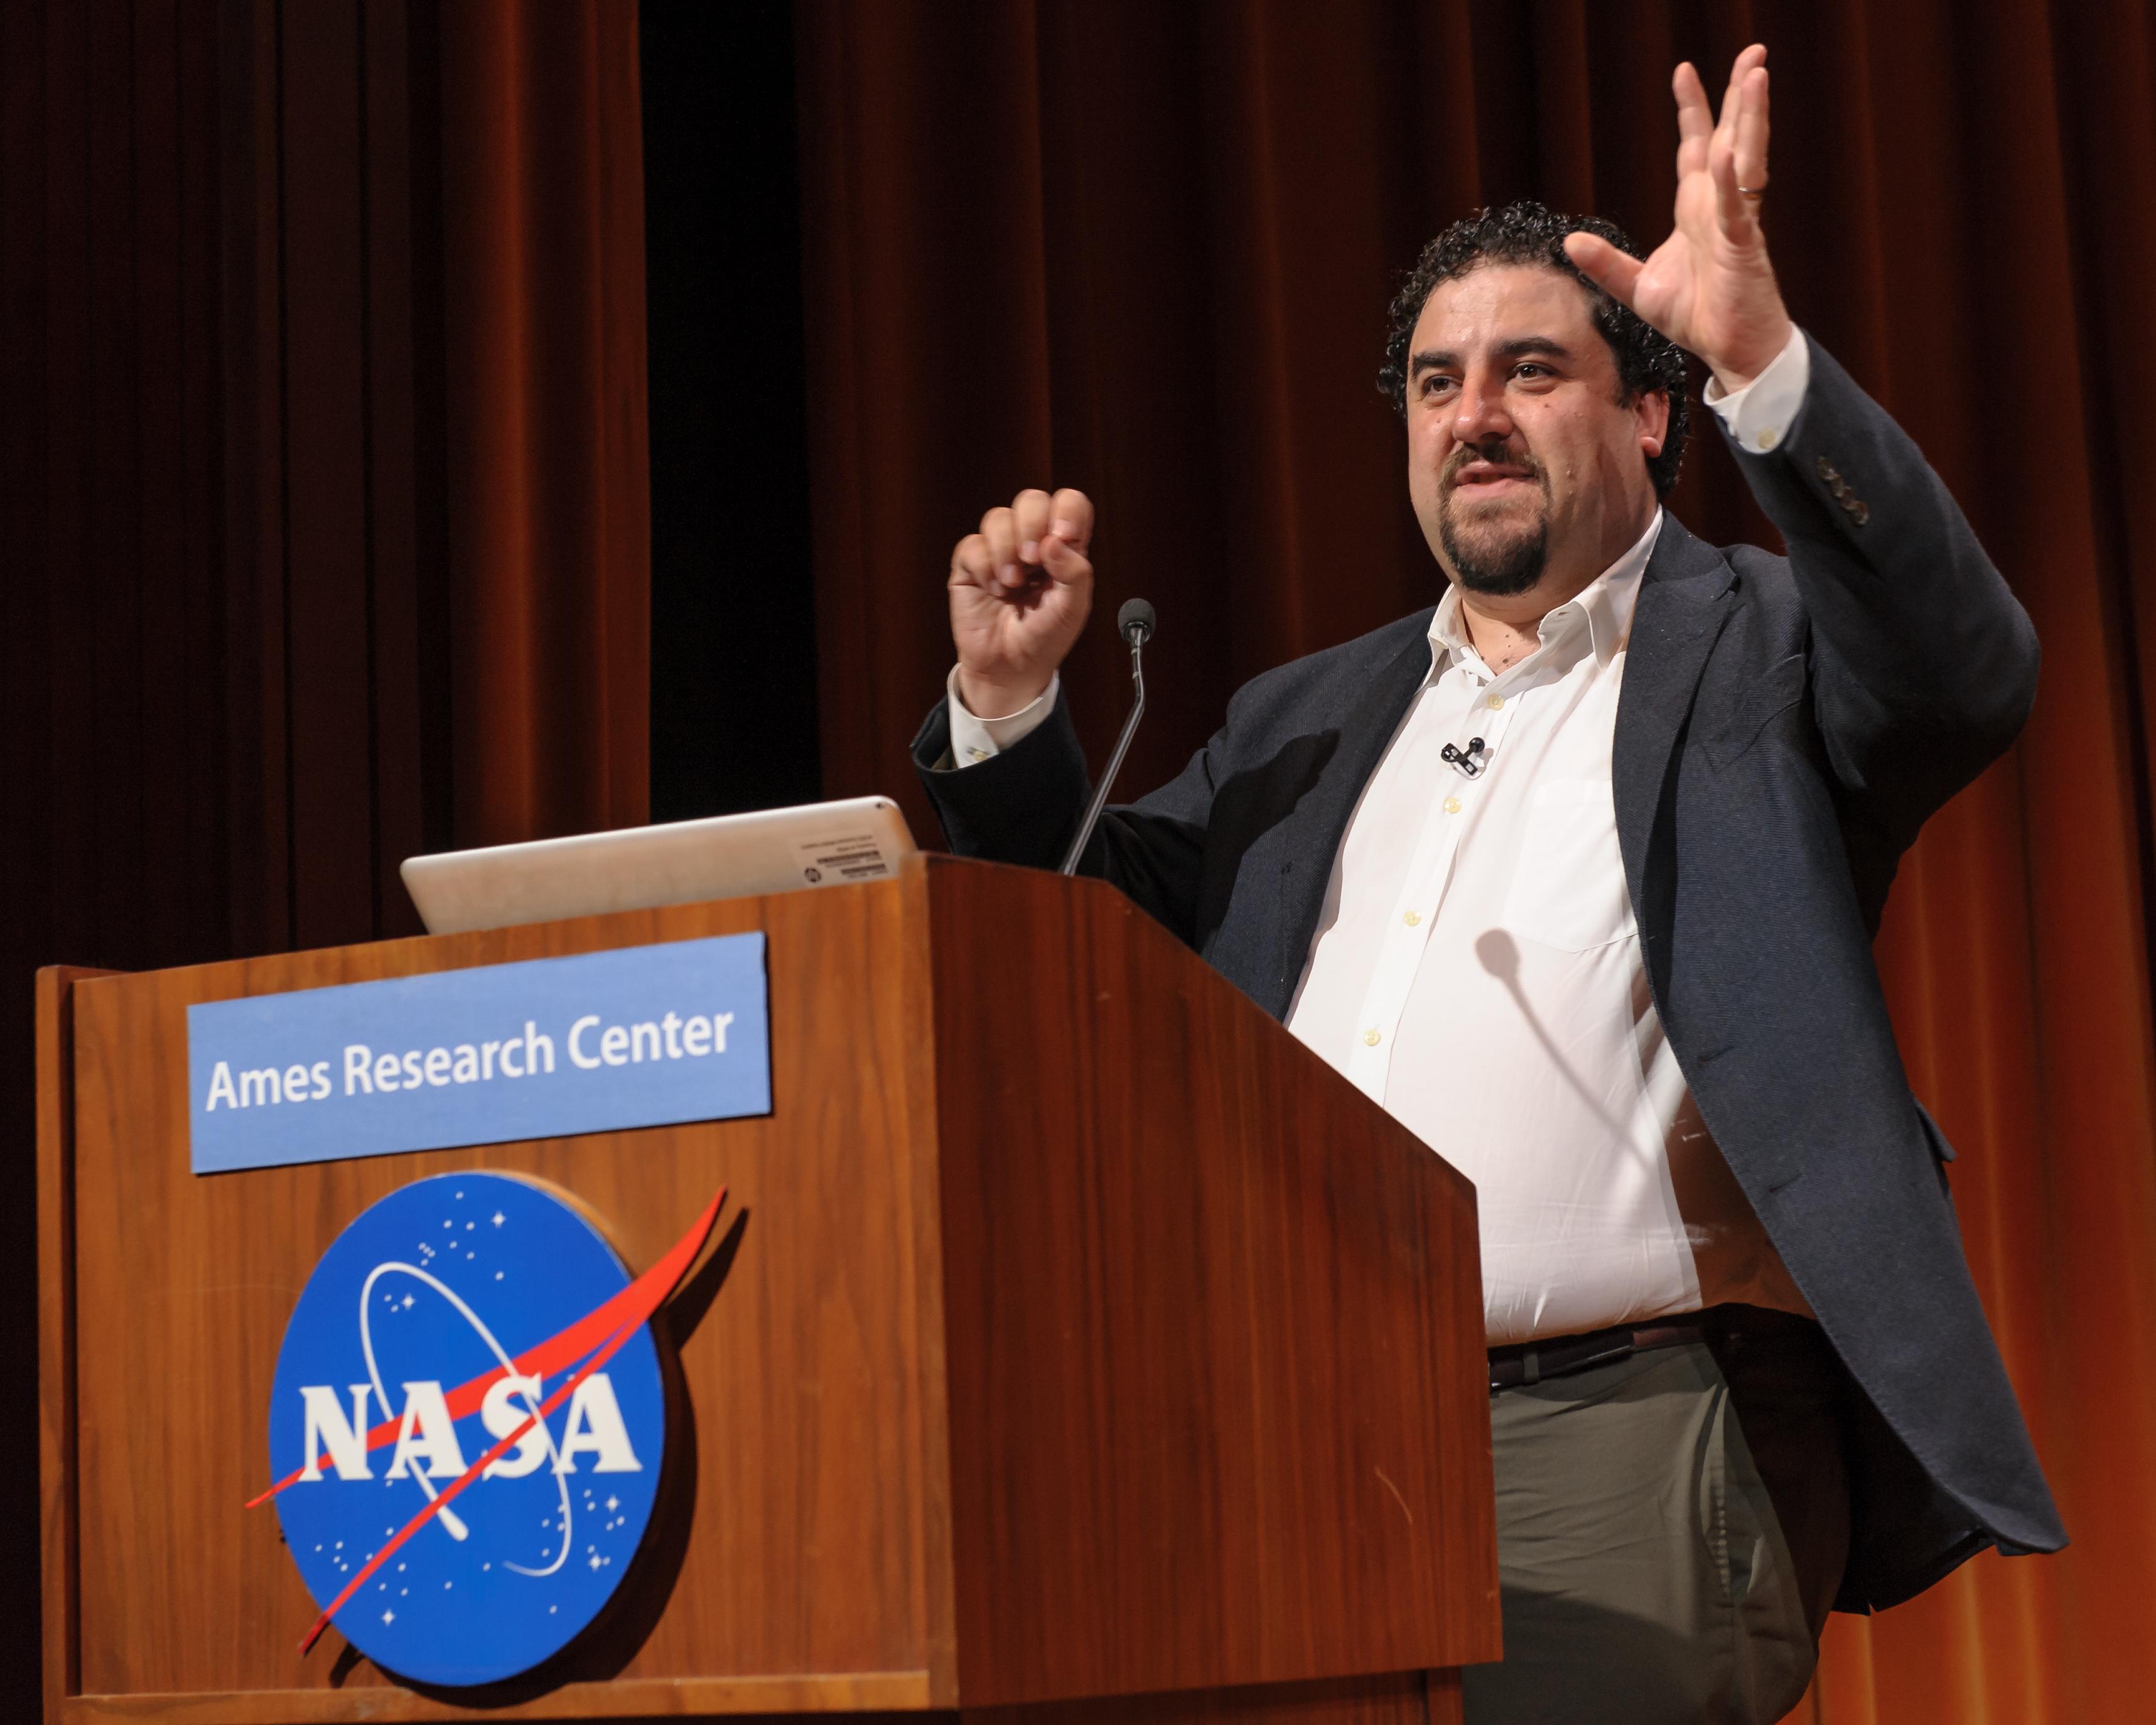 Climate & Space Professor Justin Kasper